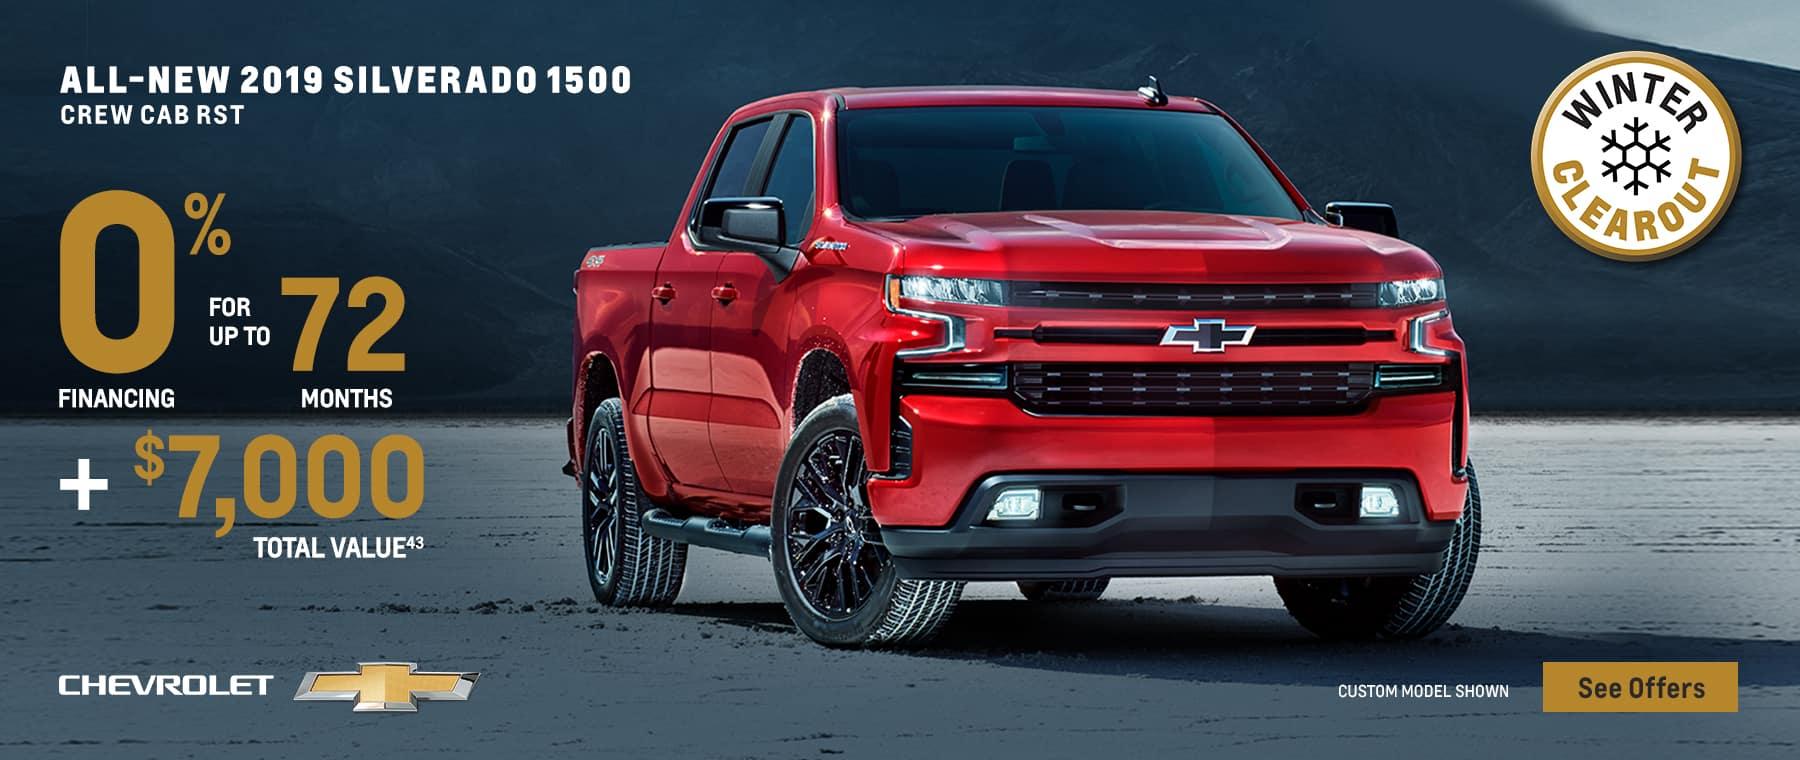 2019 ALL-NEW SILVERADO CREW CAB RST